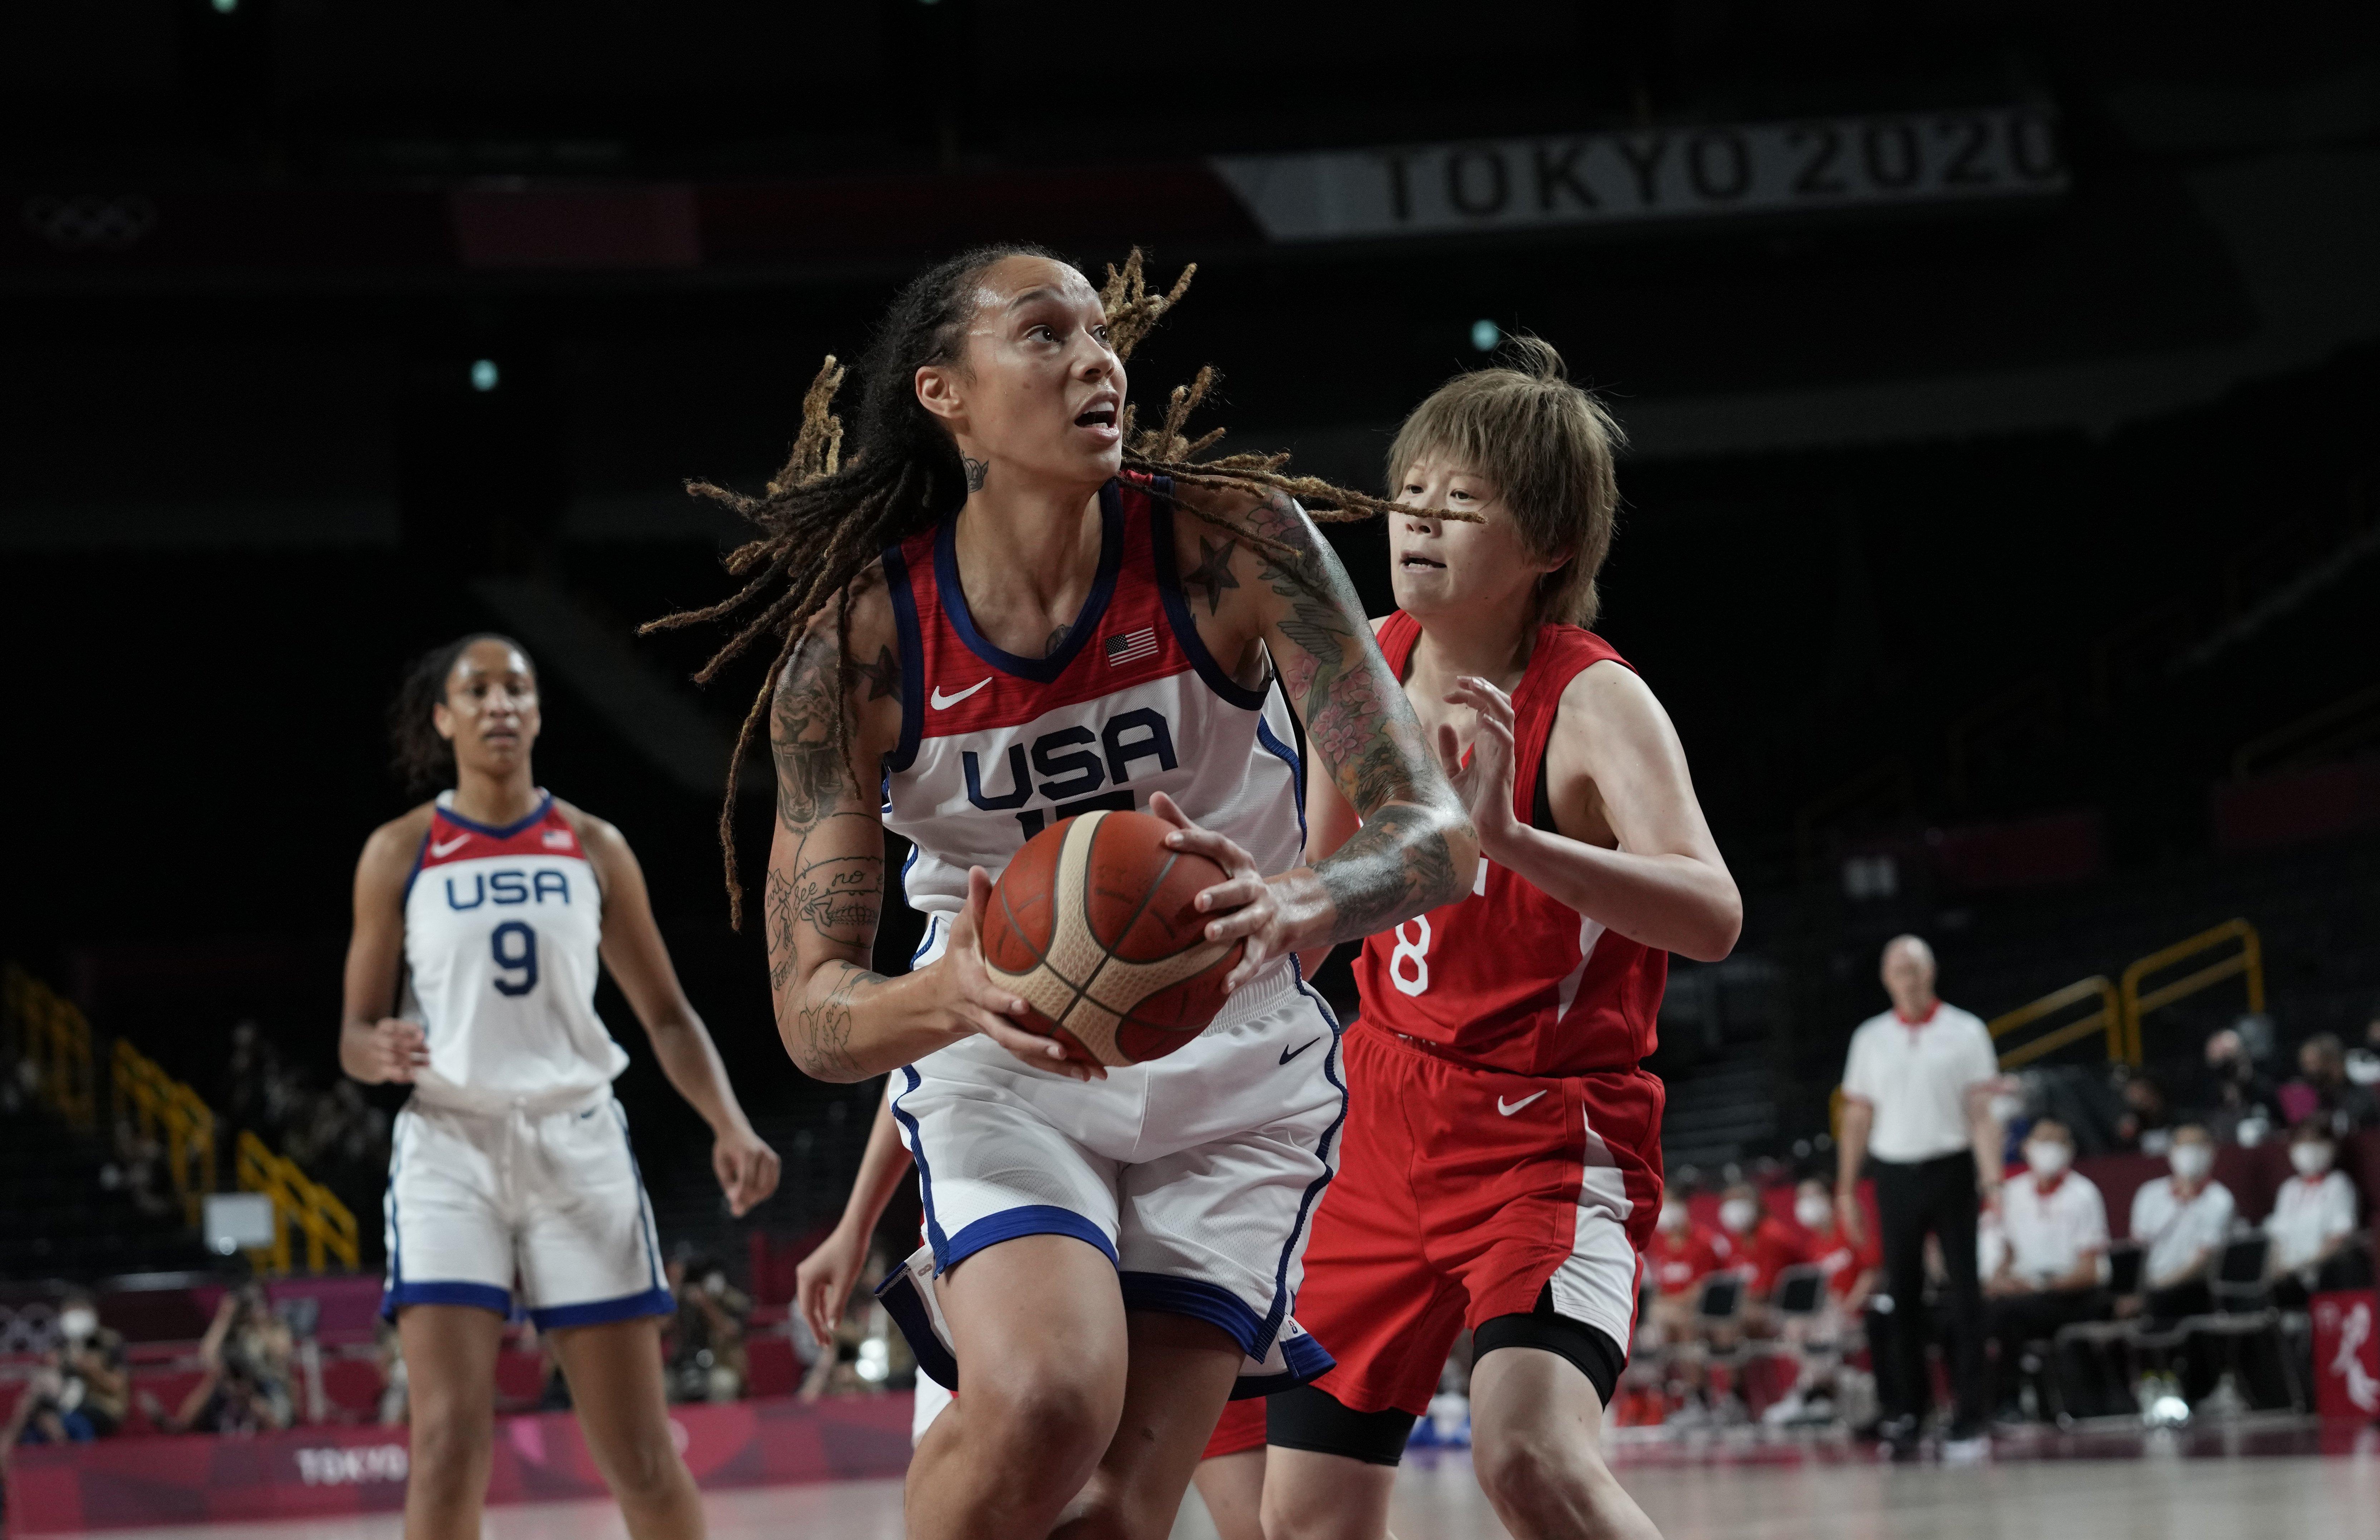 U.S. women's basketball team wins Olympic gold against Japan